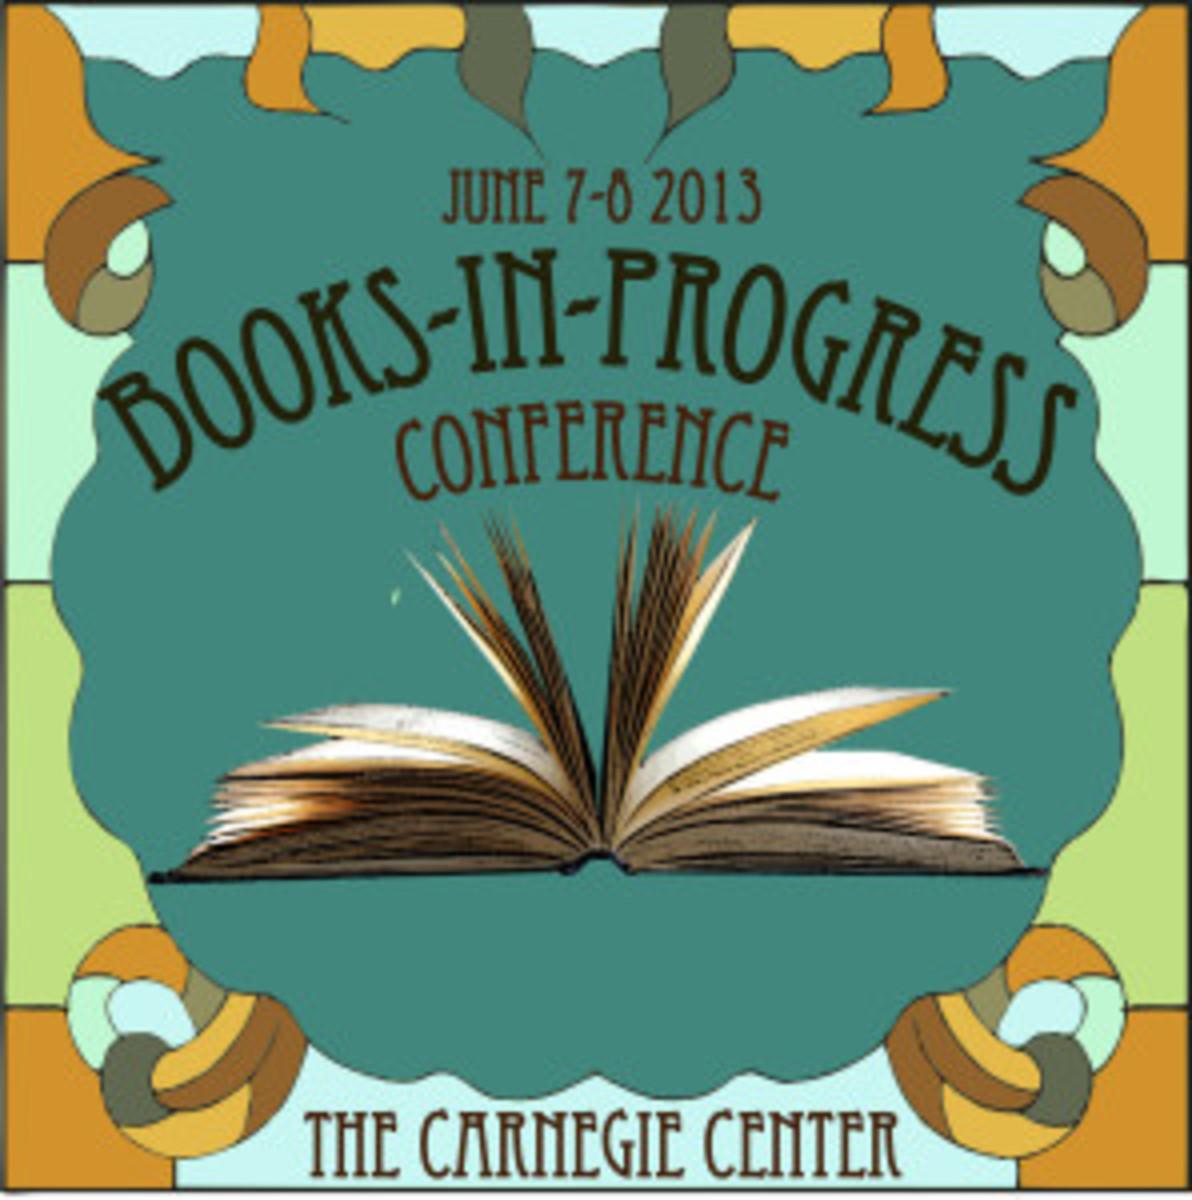 books-in-progress-carnegie-center